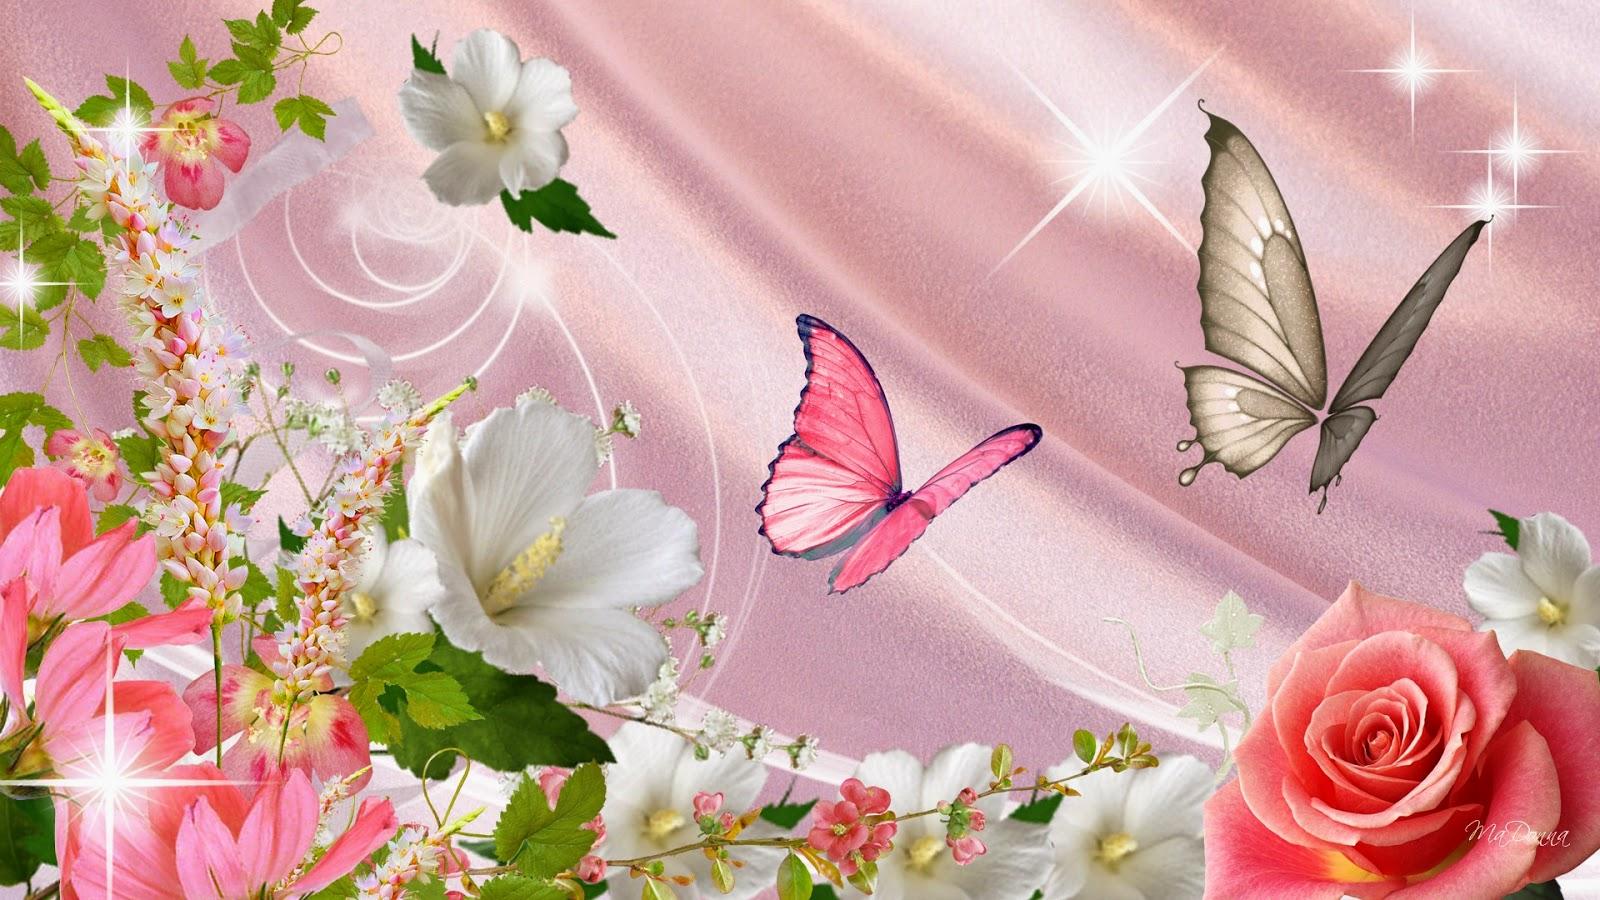 Flower Wallpaper Wallpapers On Beautiful Of Flowers